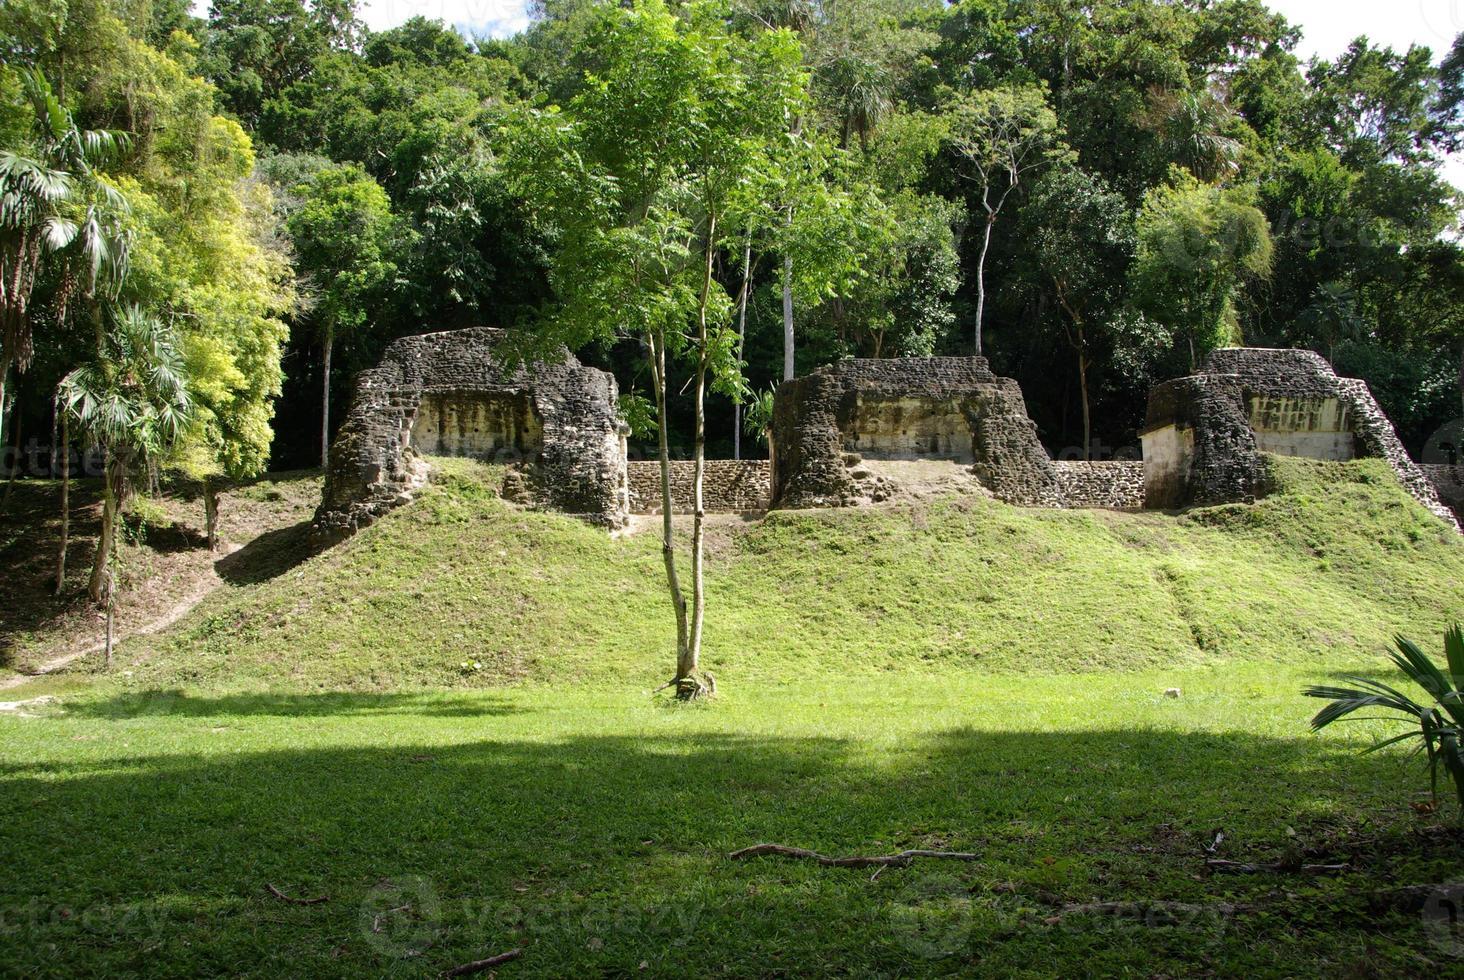 Maya-Ruinen in Tikal, Guatemala foto